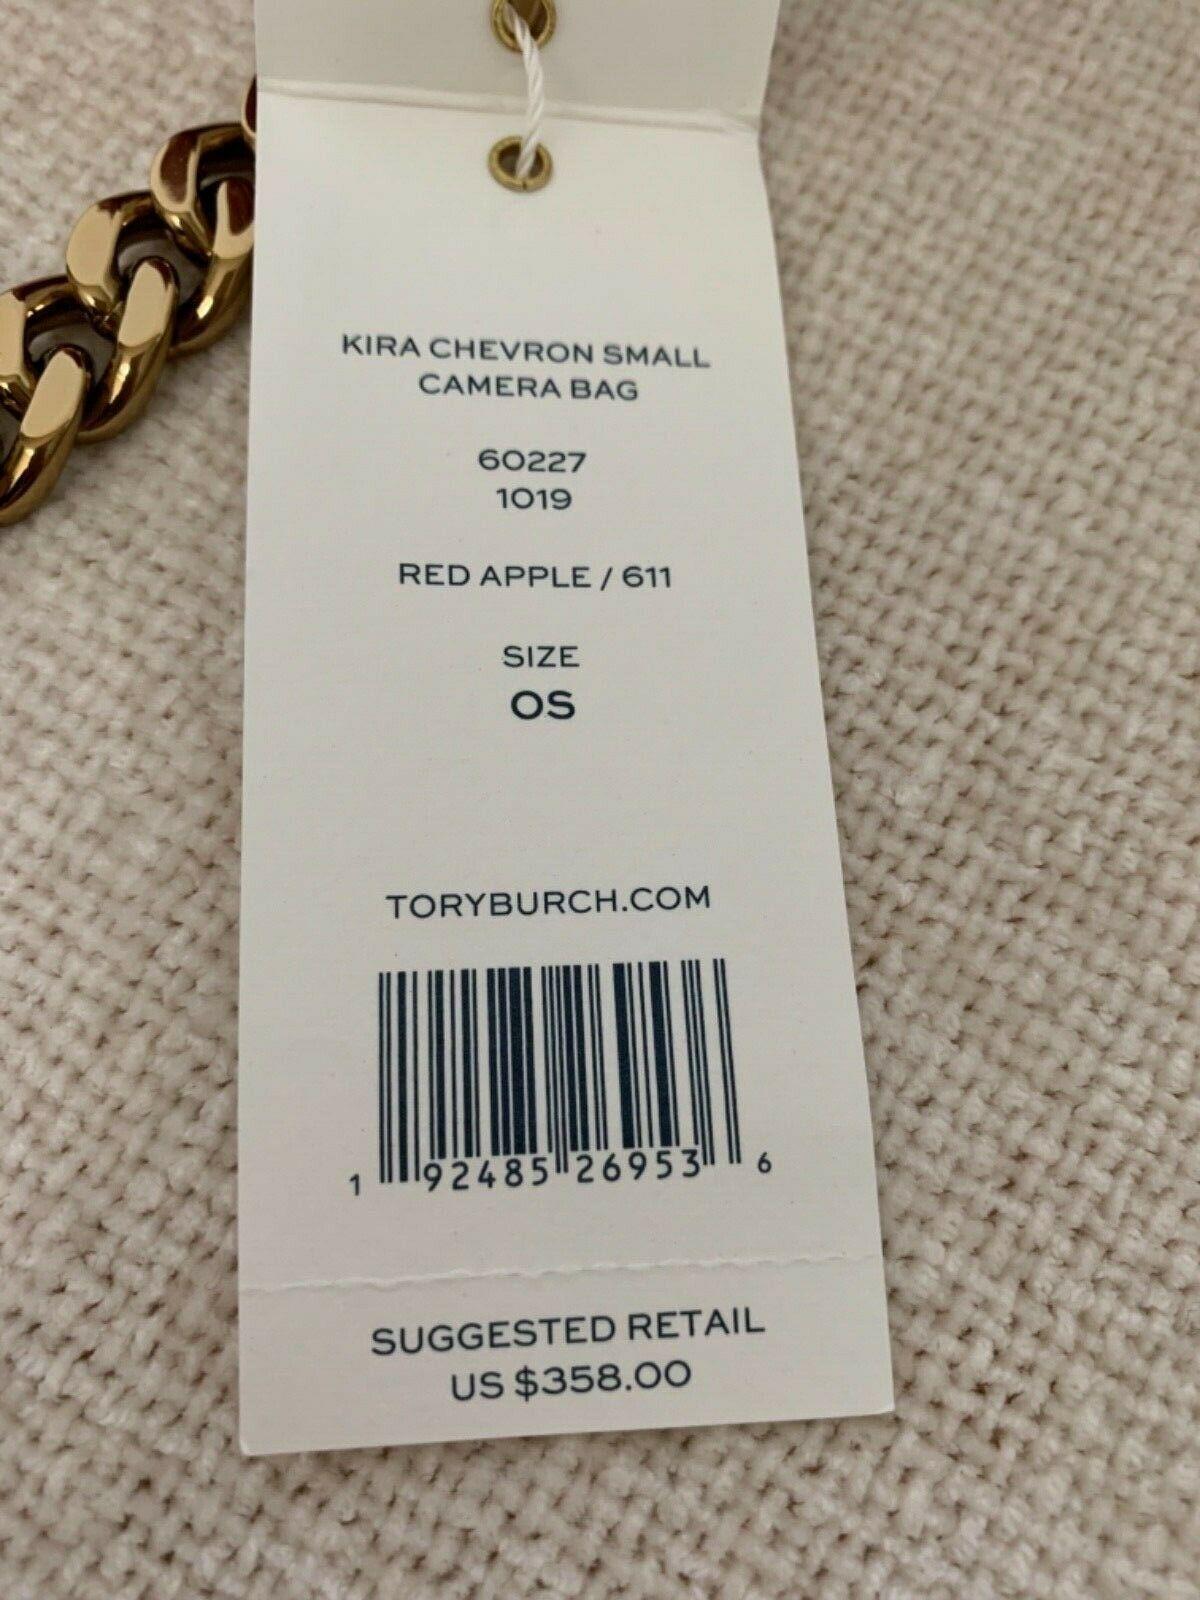 NWT Tory Burch Red Apple Kira Chevron Small Camera Bag $358 image 11